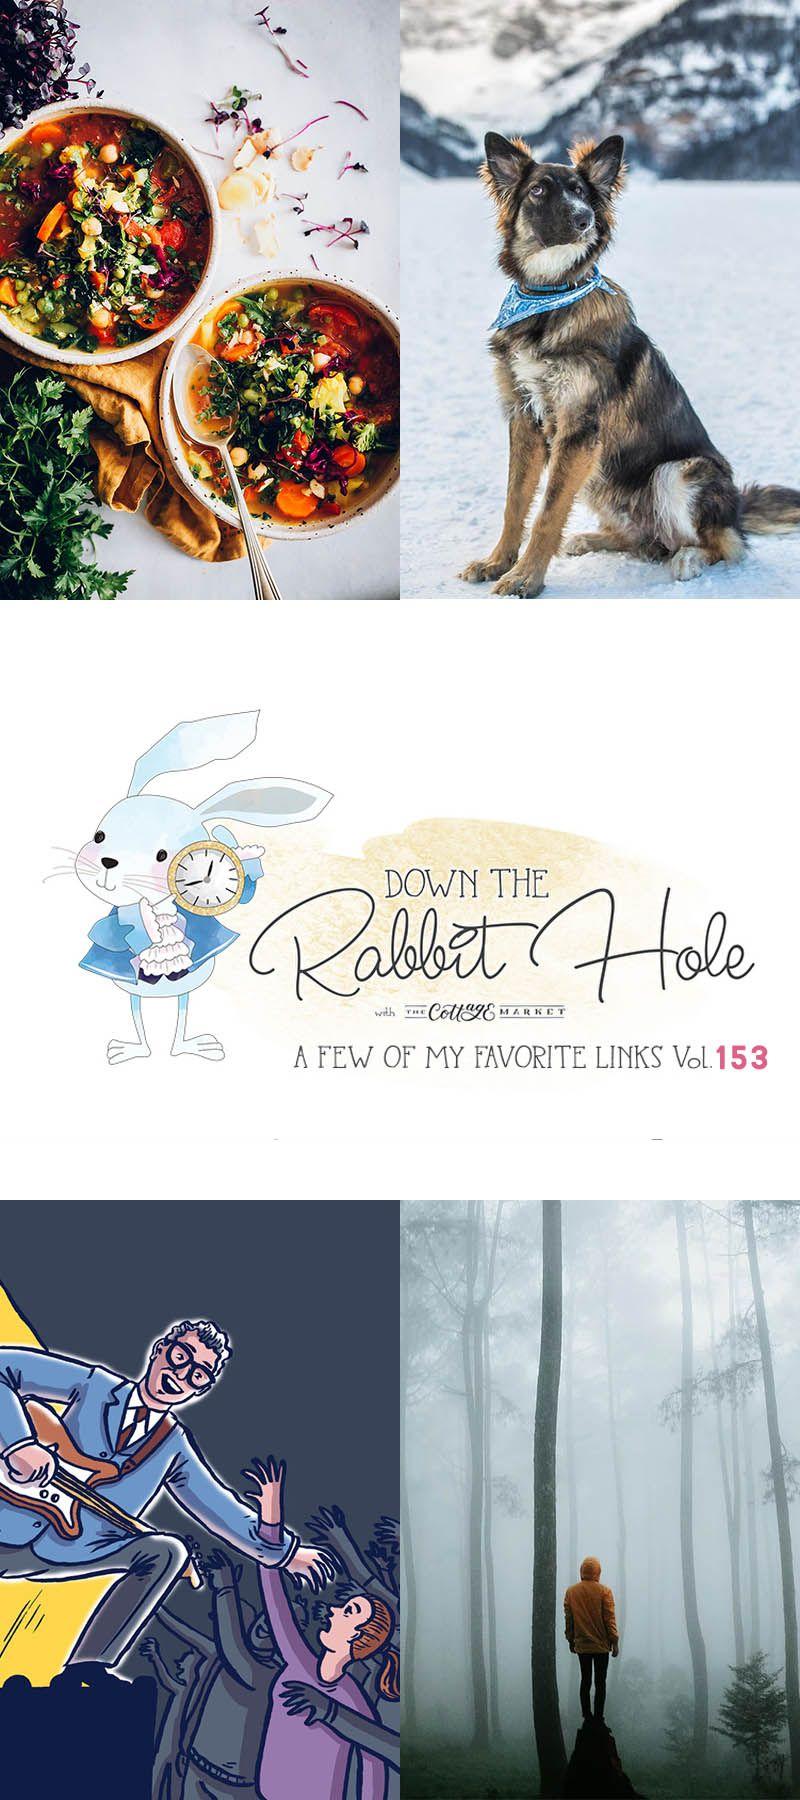 Down the Rabbit Hole Where Fun Links & Pet Rescues Meet